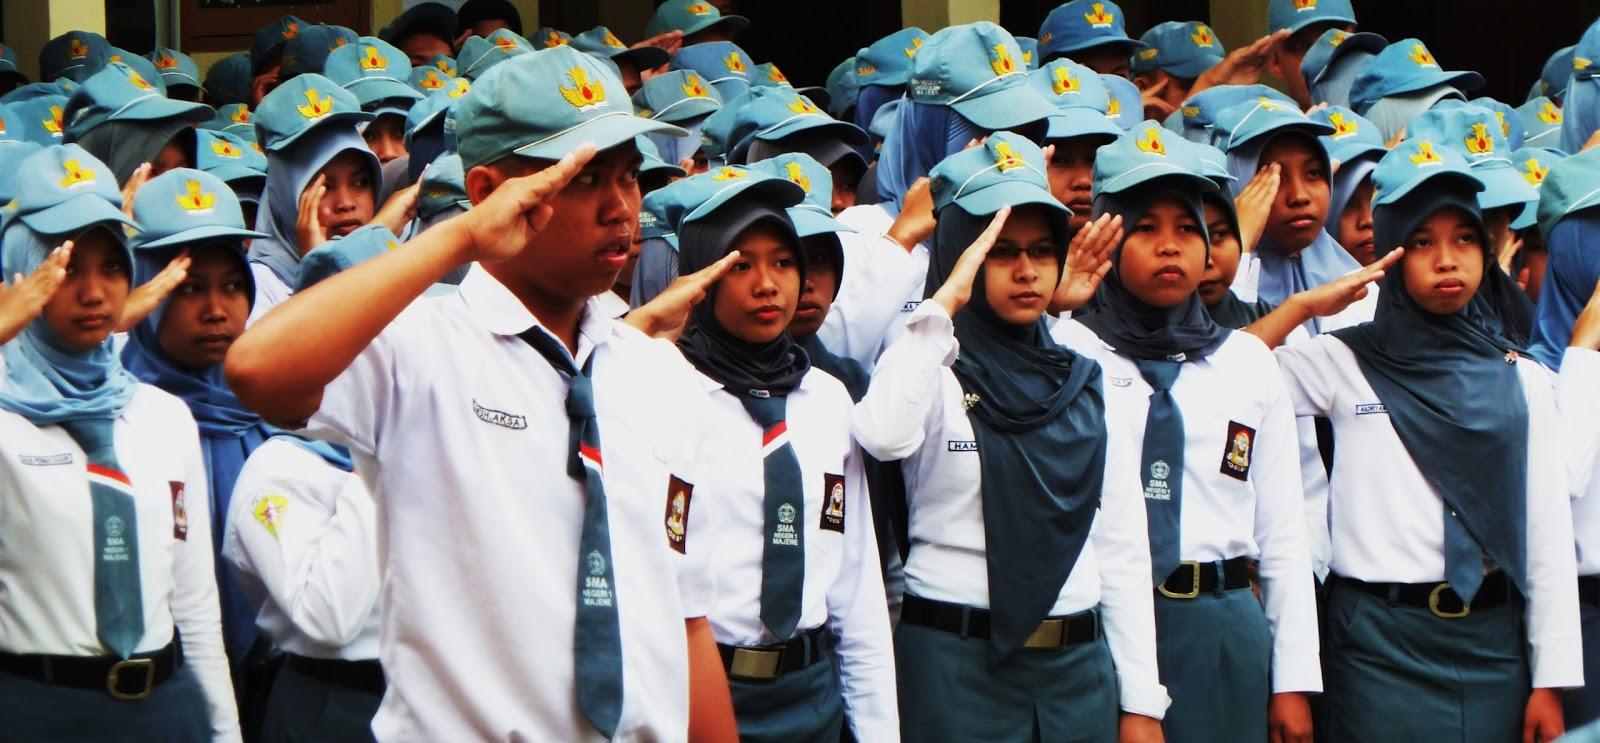 Lowongan Kerja Lulusan Ijazah Tamatan Sma Di Lampung Terbaru Juni 2021 Karir Bandar Lampung